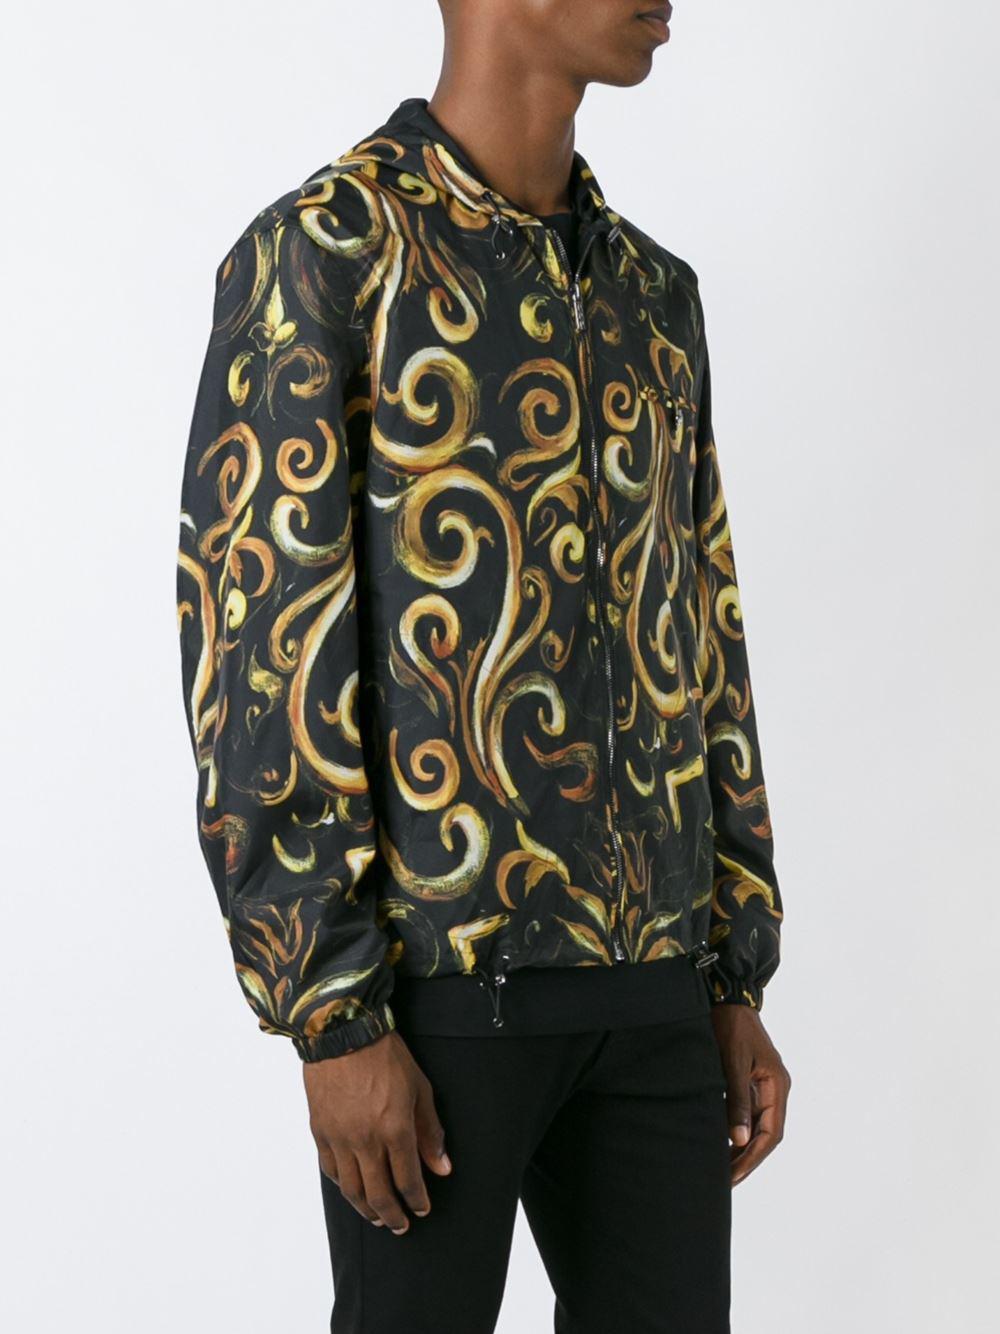 Versace Baroque Hooded Jacket In Black For Men Lyst